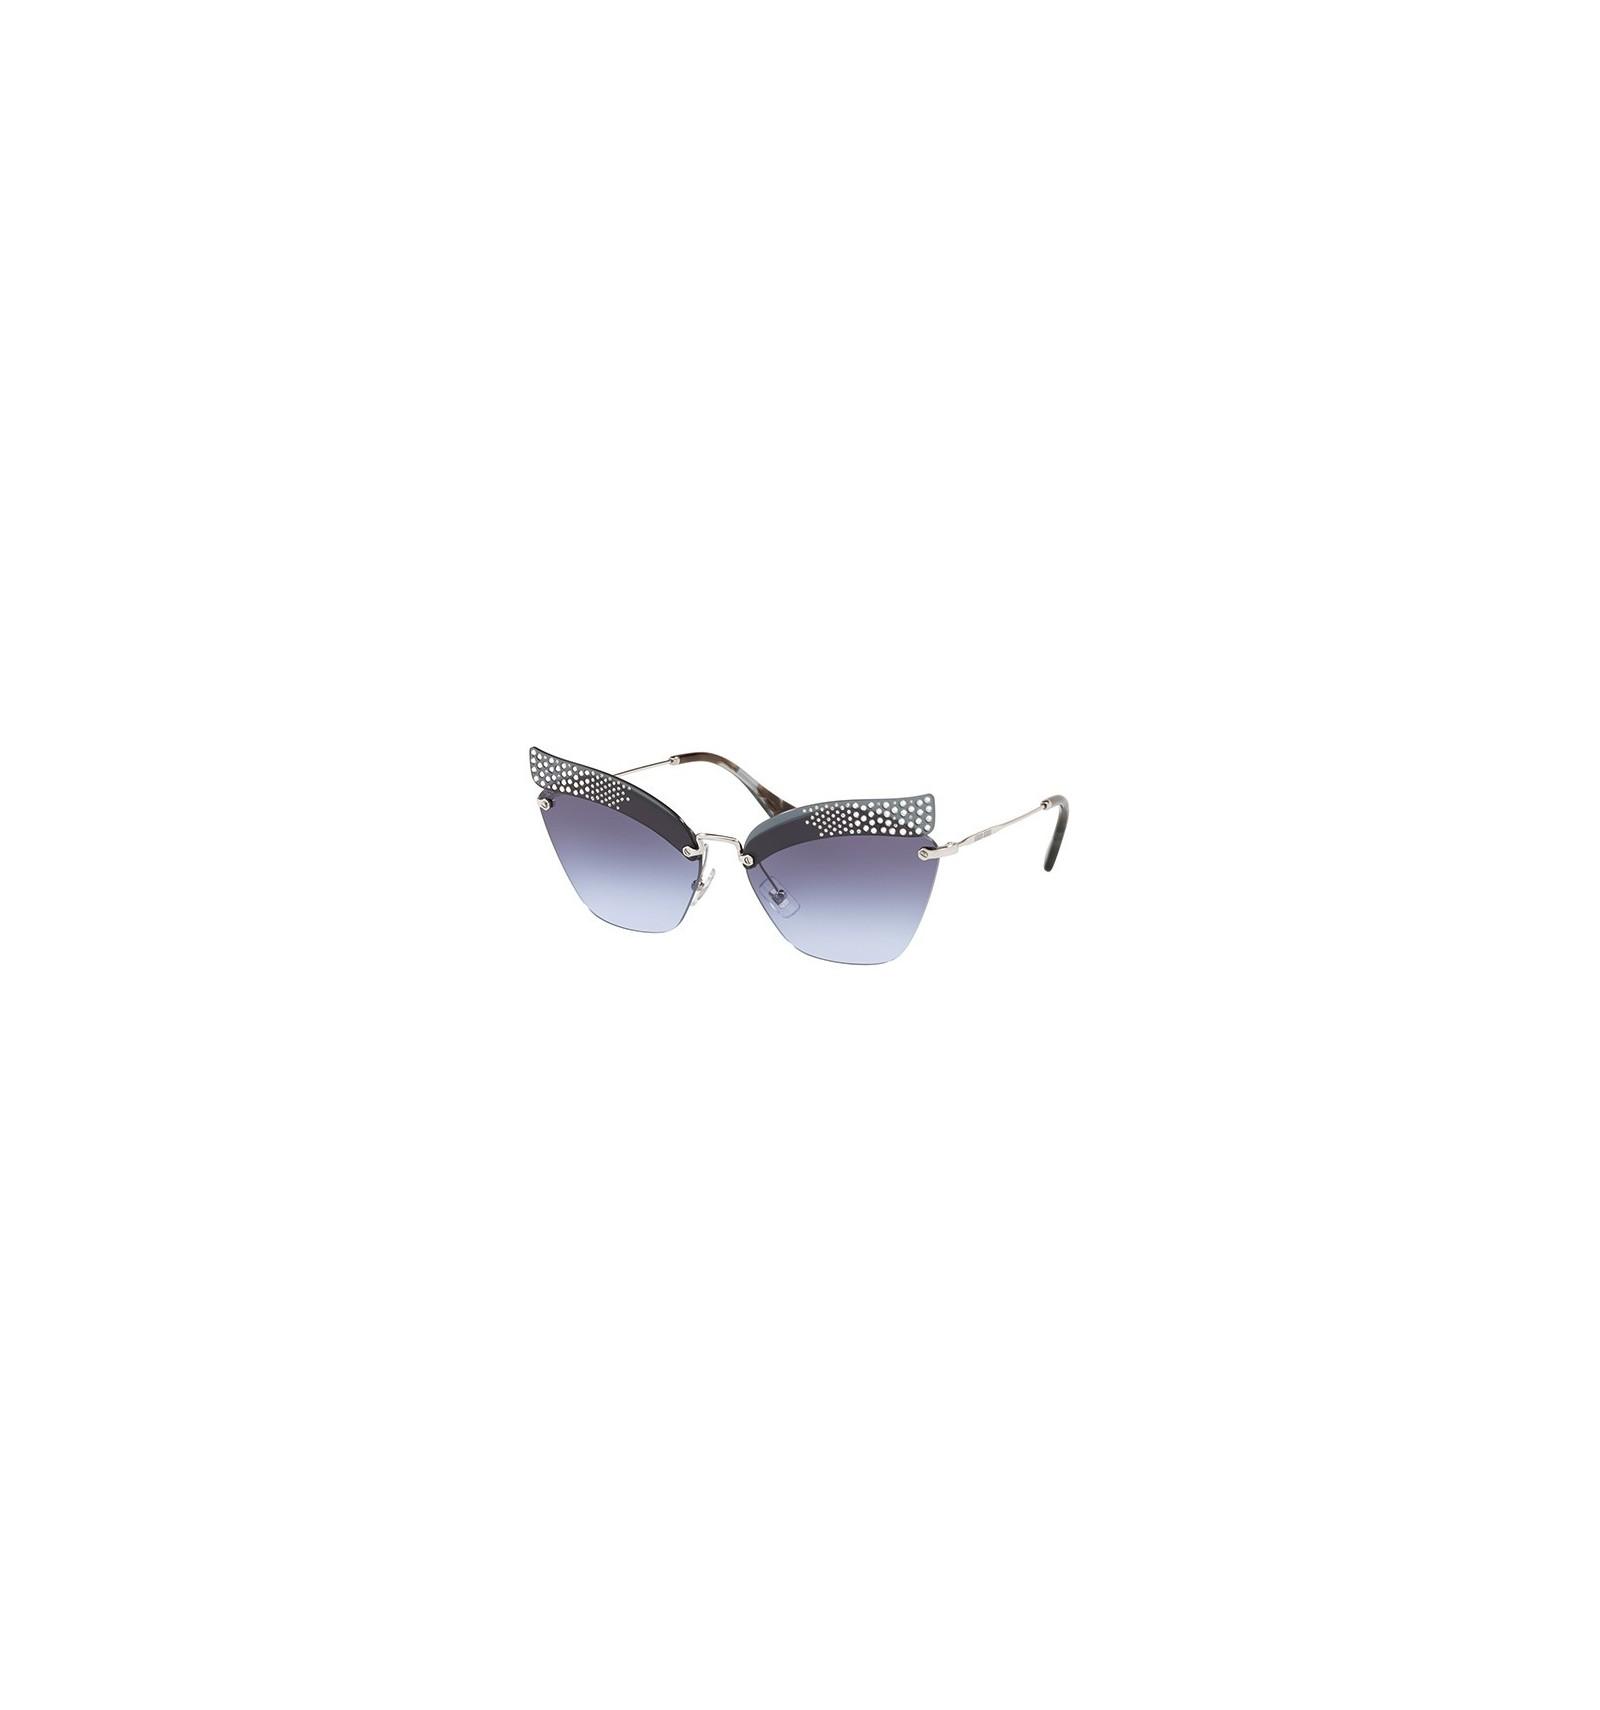 1d3e12300f Gafas de sol MIU MIU SMU56TS CATWALK EVOLUTION Dark Blue - Violet Shaded  (KJG-